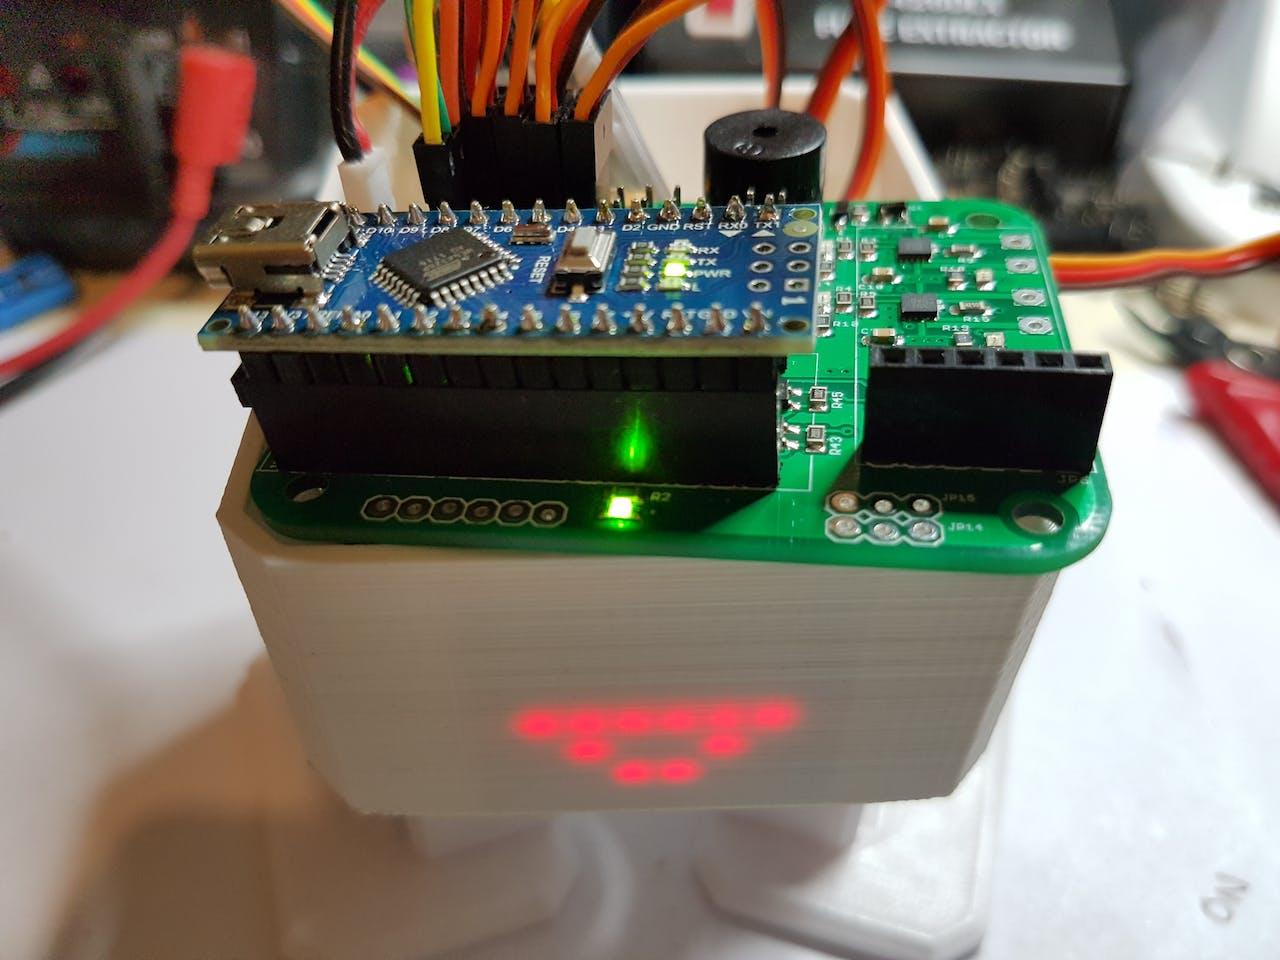 Otto Diy Pcb Elelectronic Circuit Maker Assembly Washing Machine Board